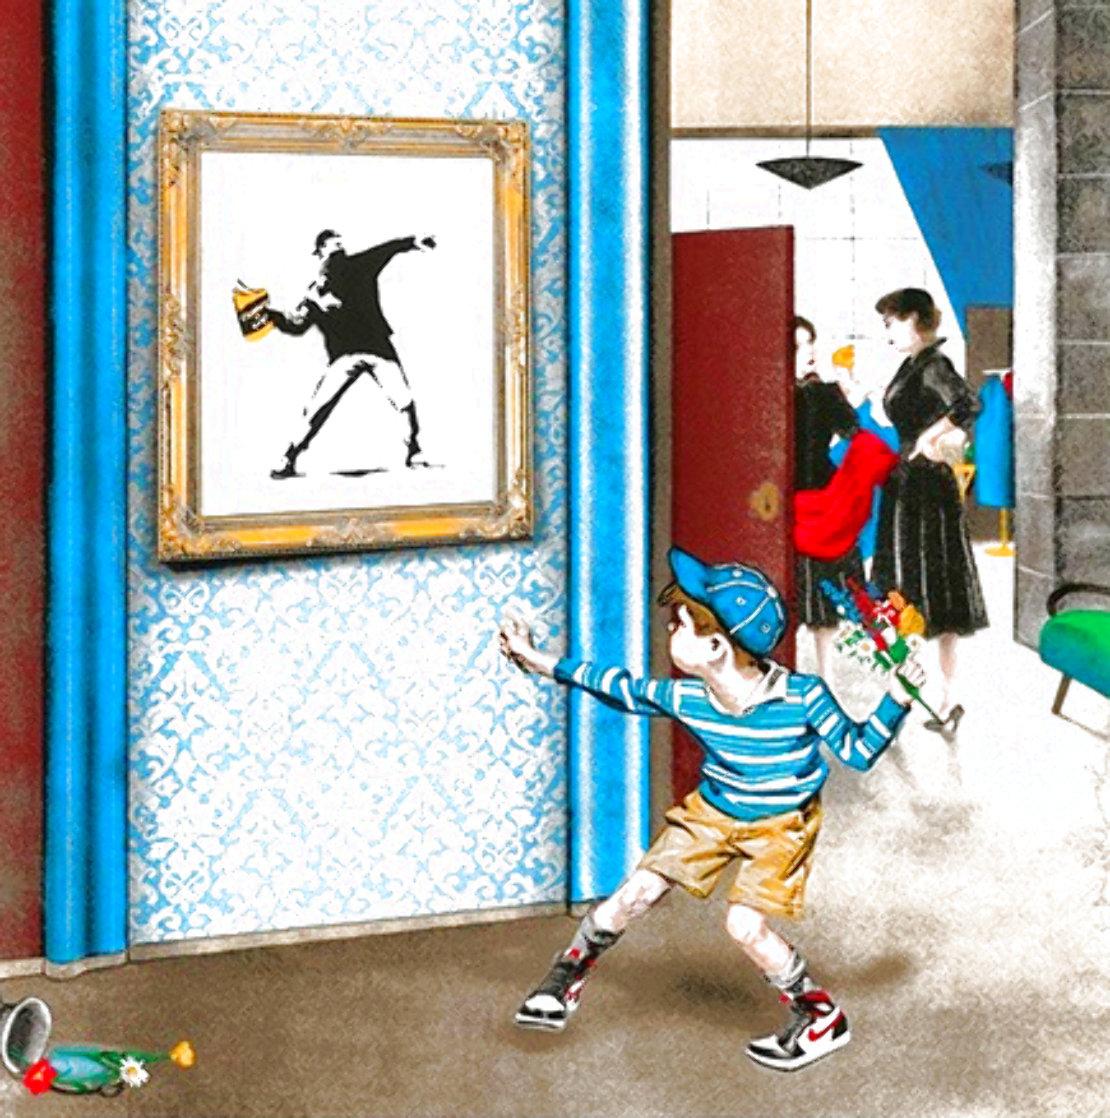 Life Imitates Art 2021 Limited Edition Print by Mr. Brainwash